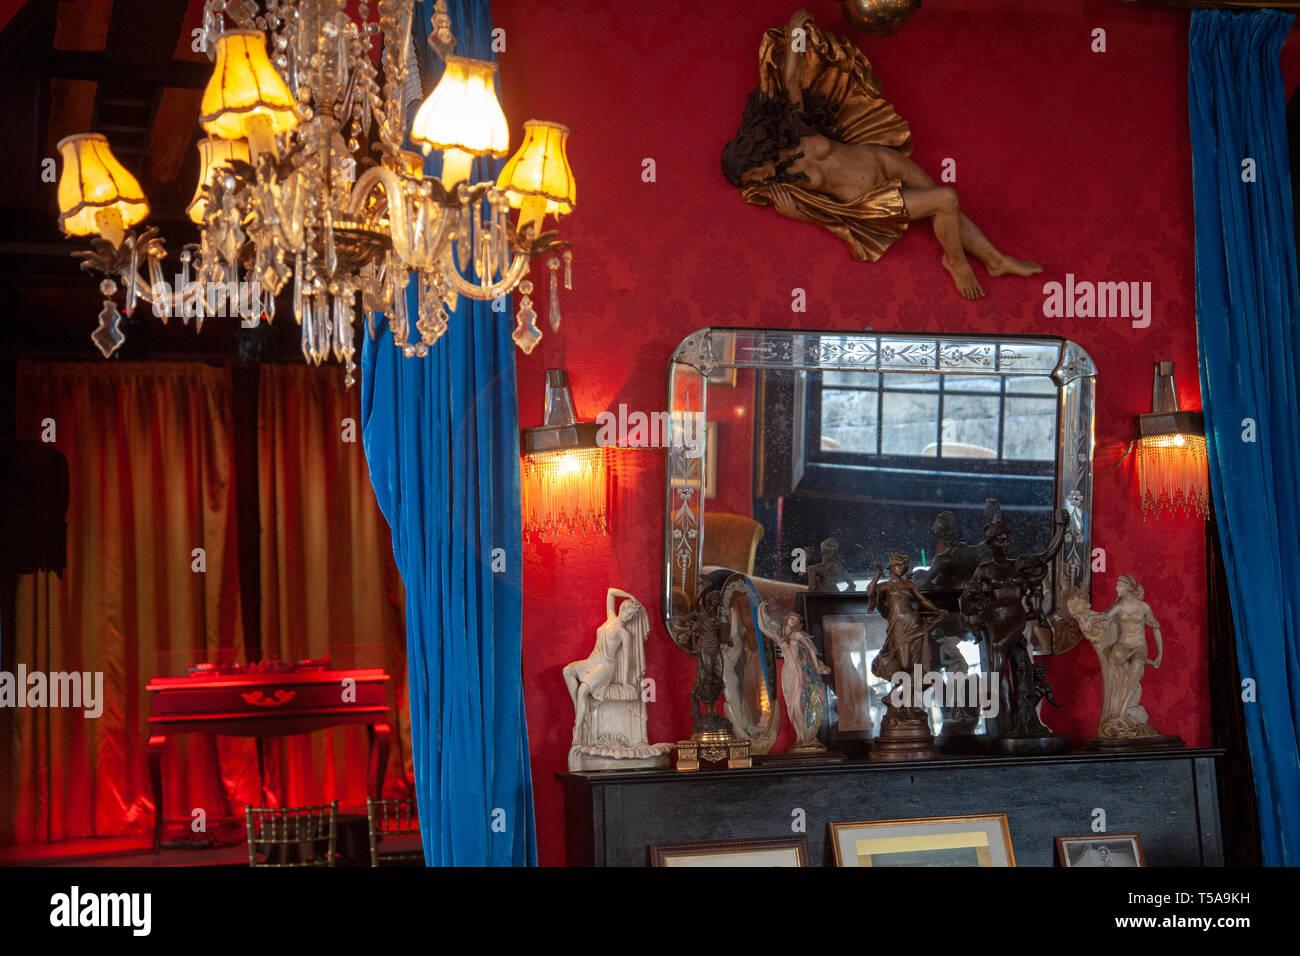 Pensao Amor Bar en Lisboa, Portugal. Imagen De Stock